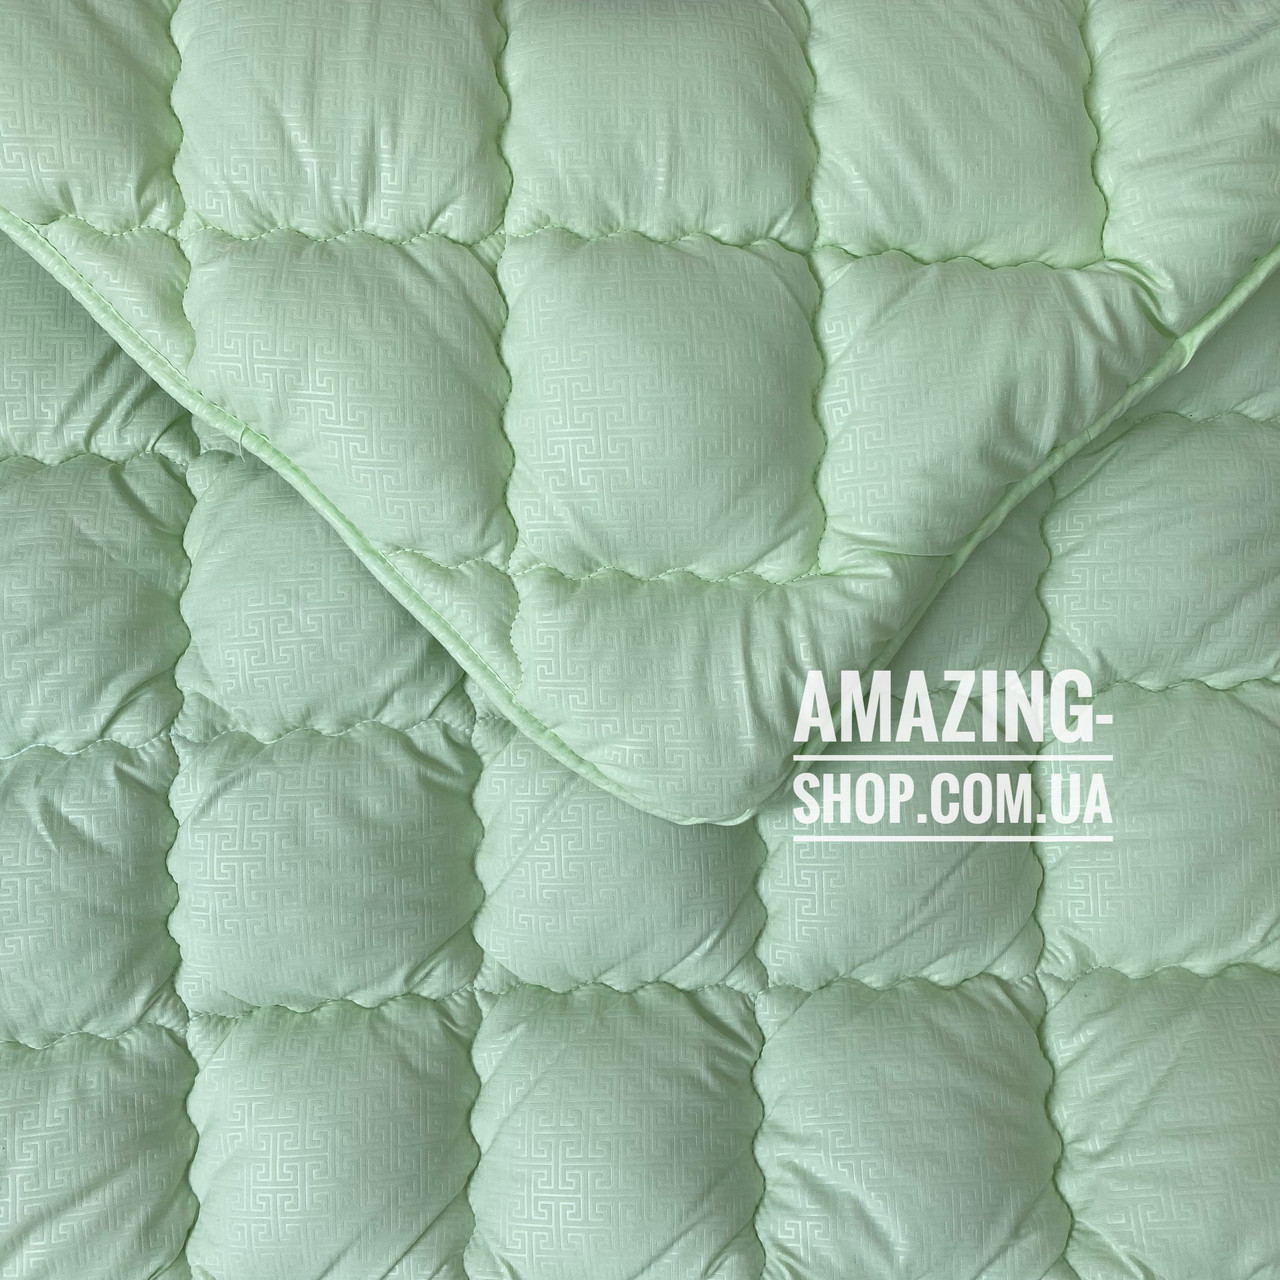 "Одеяло полуторное на холлофайбере ""ODA"" 155*210 см   Тепла ковдра, наповнювач холлофайбер. Стеганое одеяло ОДА"